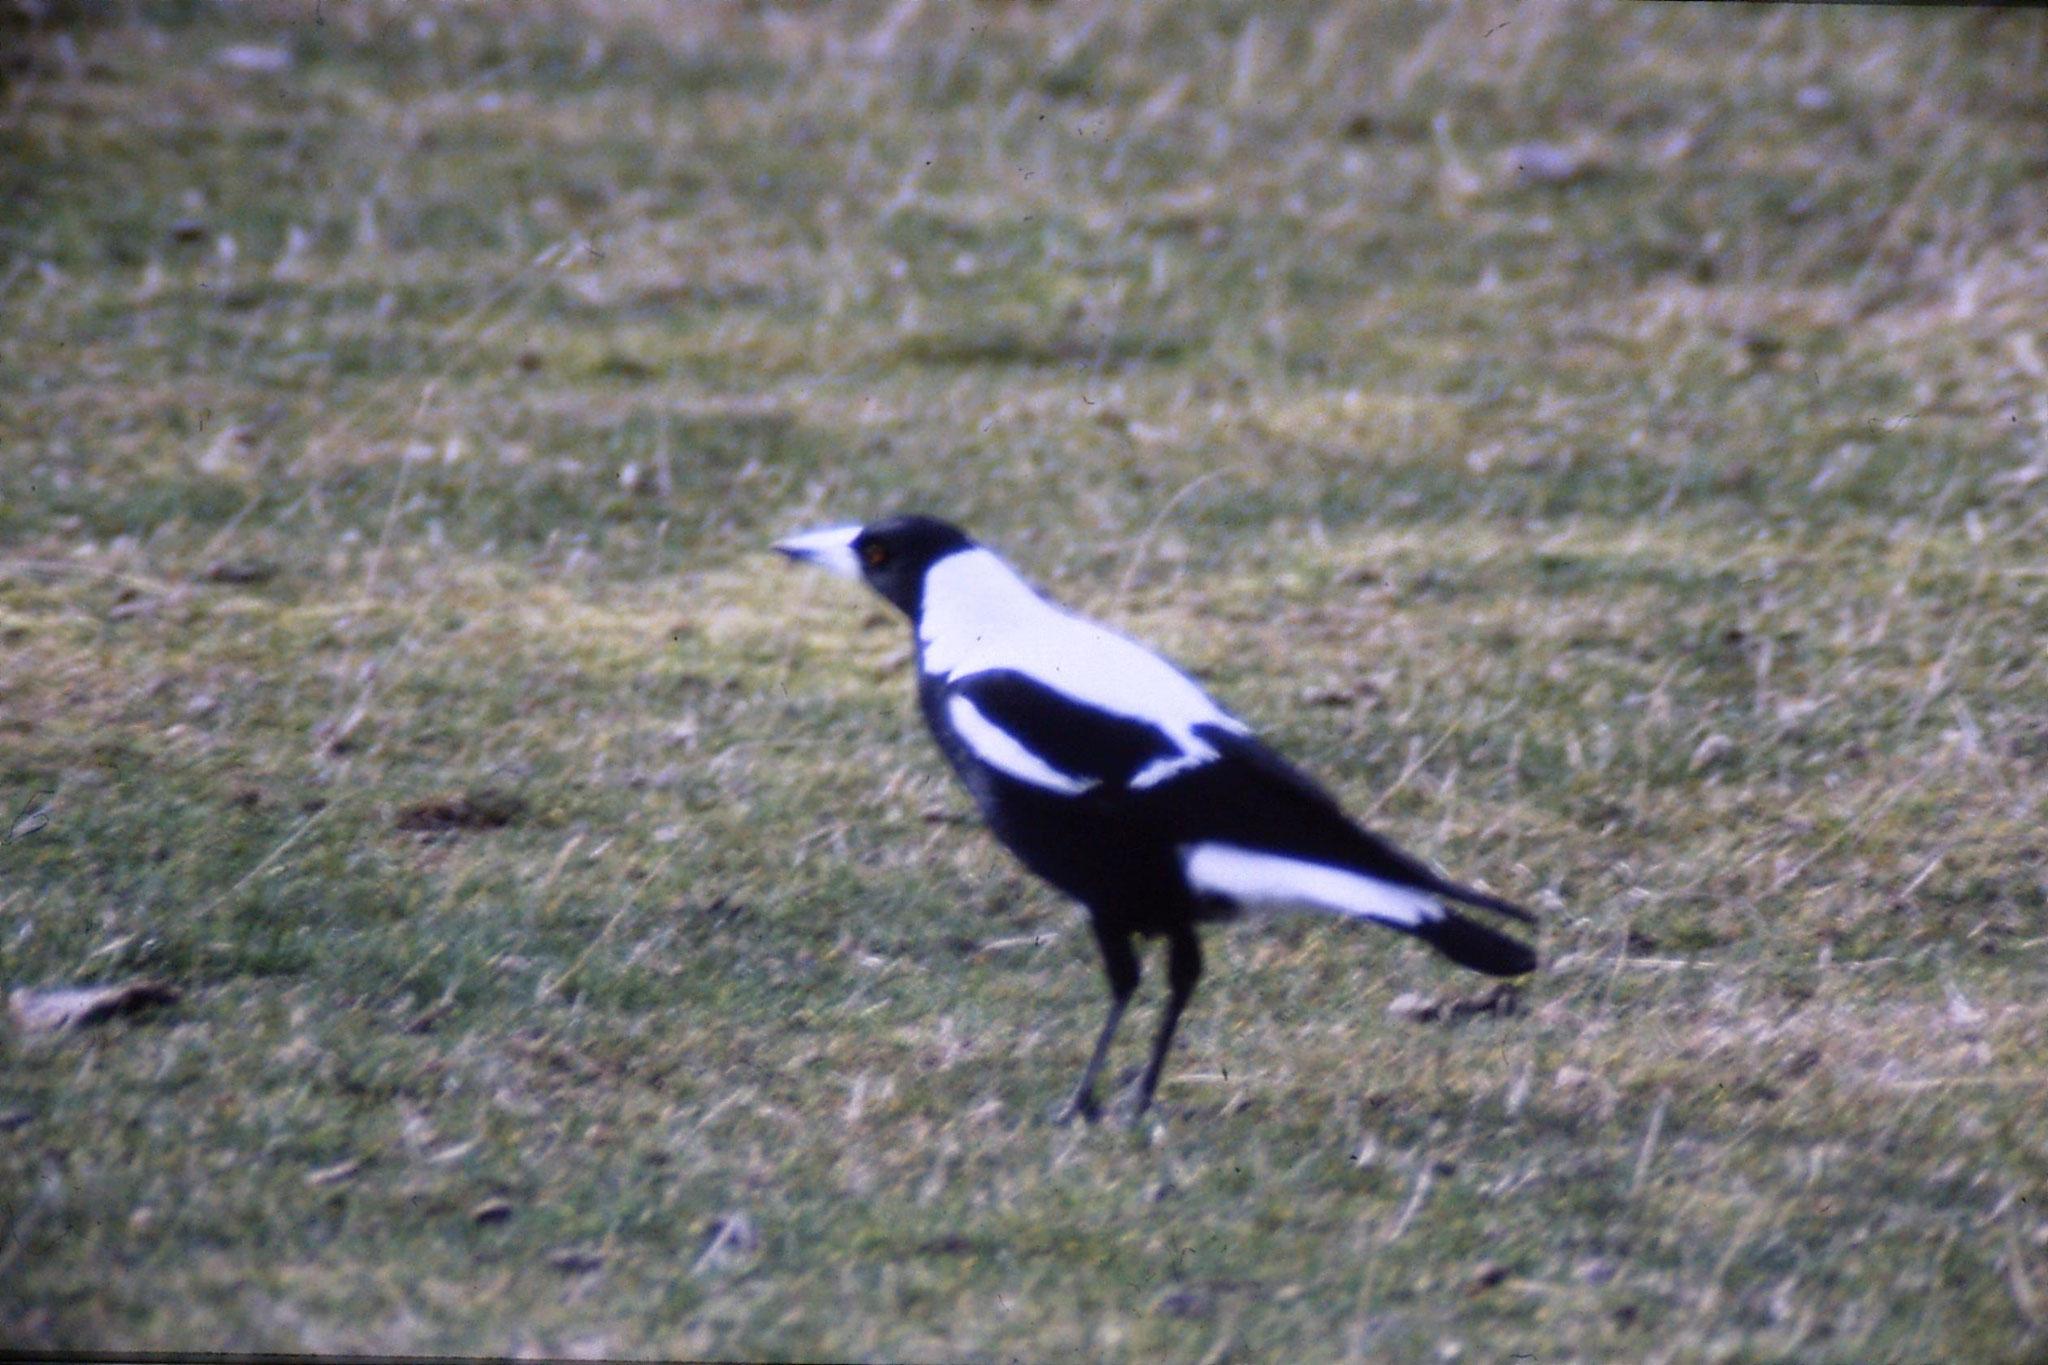 13/8/1990: 30: Australian magpie